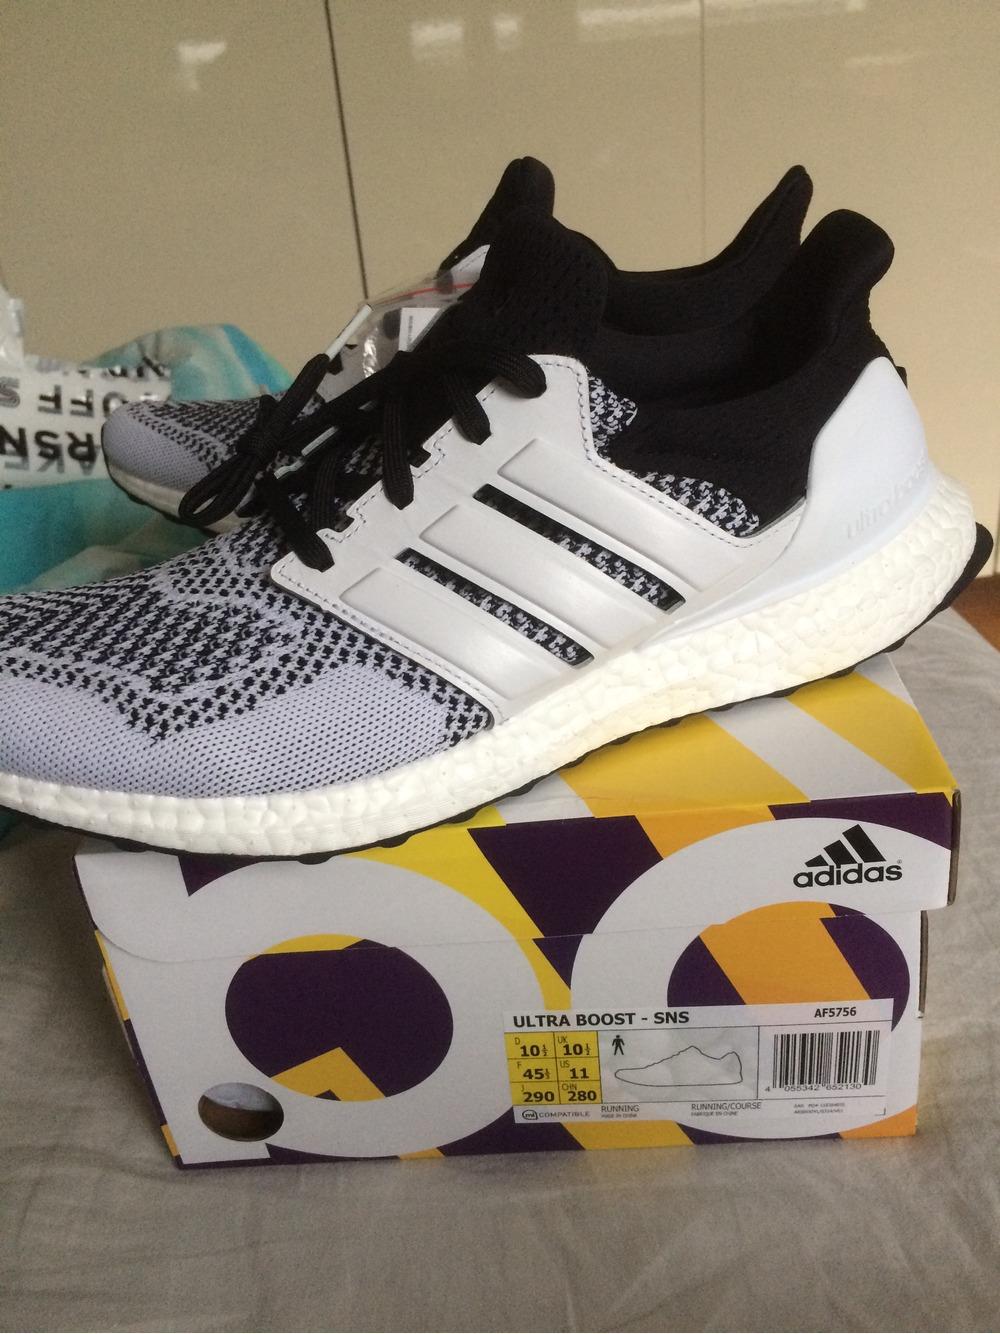 Adidas Ultra Boost 11